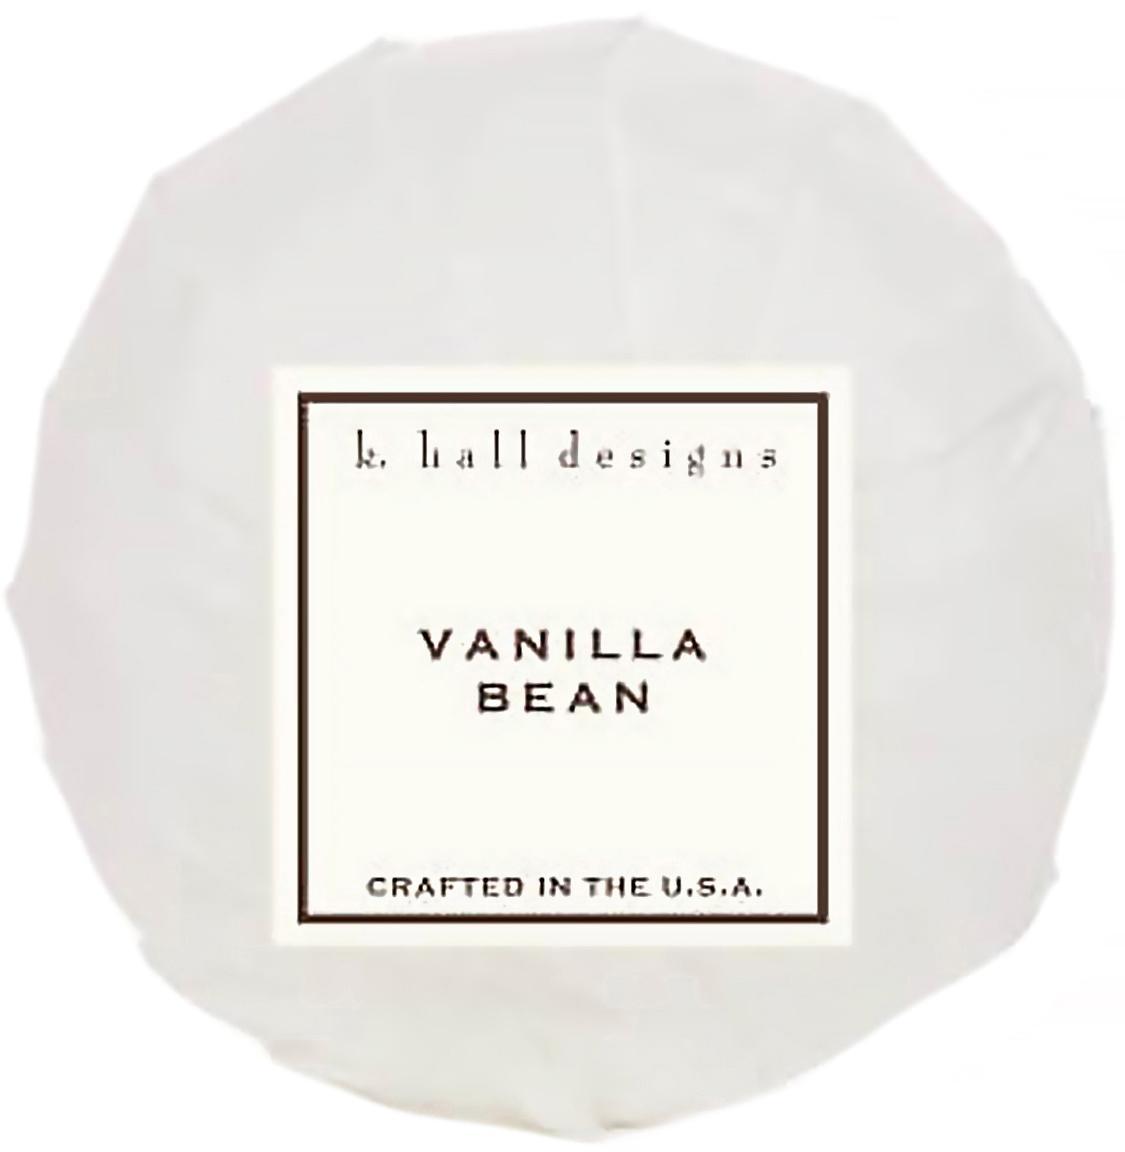 Sfera da bagno Vanilla Bean (vaniglia e fava tonka), Bianco, Ø 7 x Alt. 7 cm